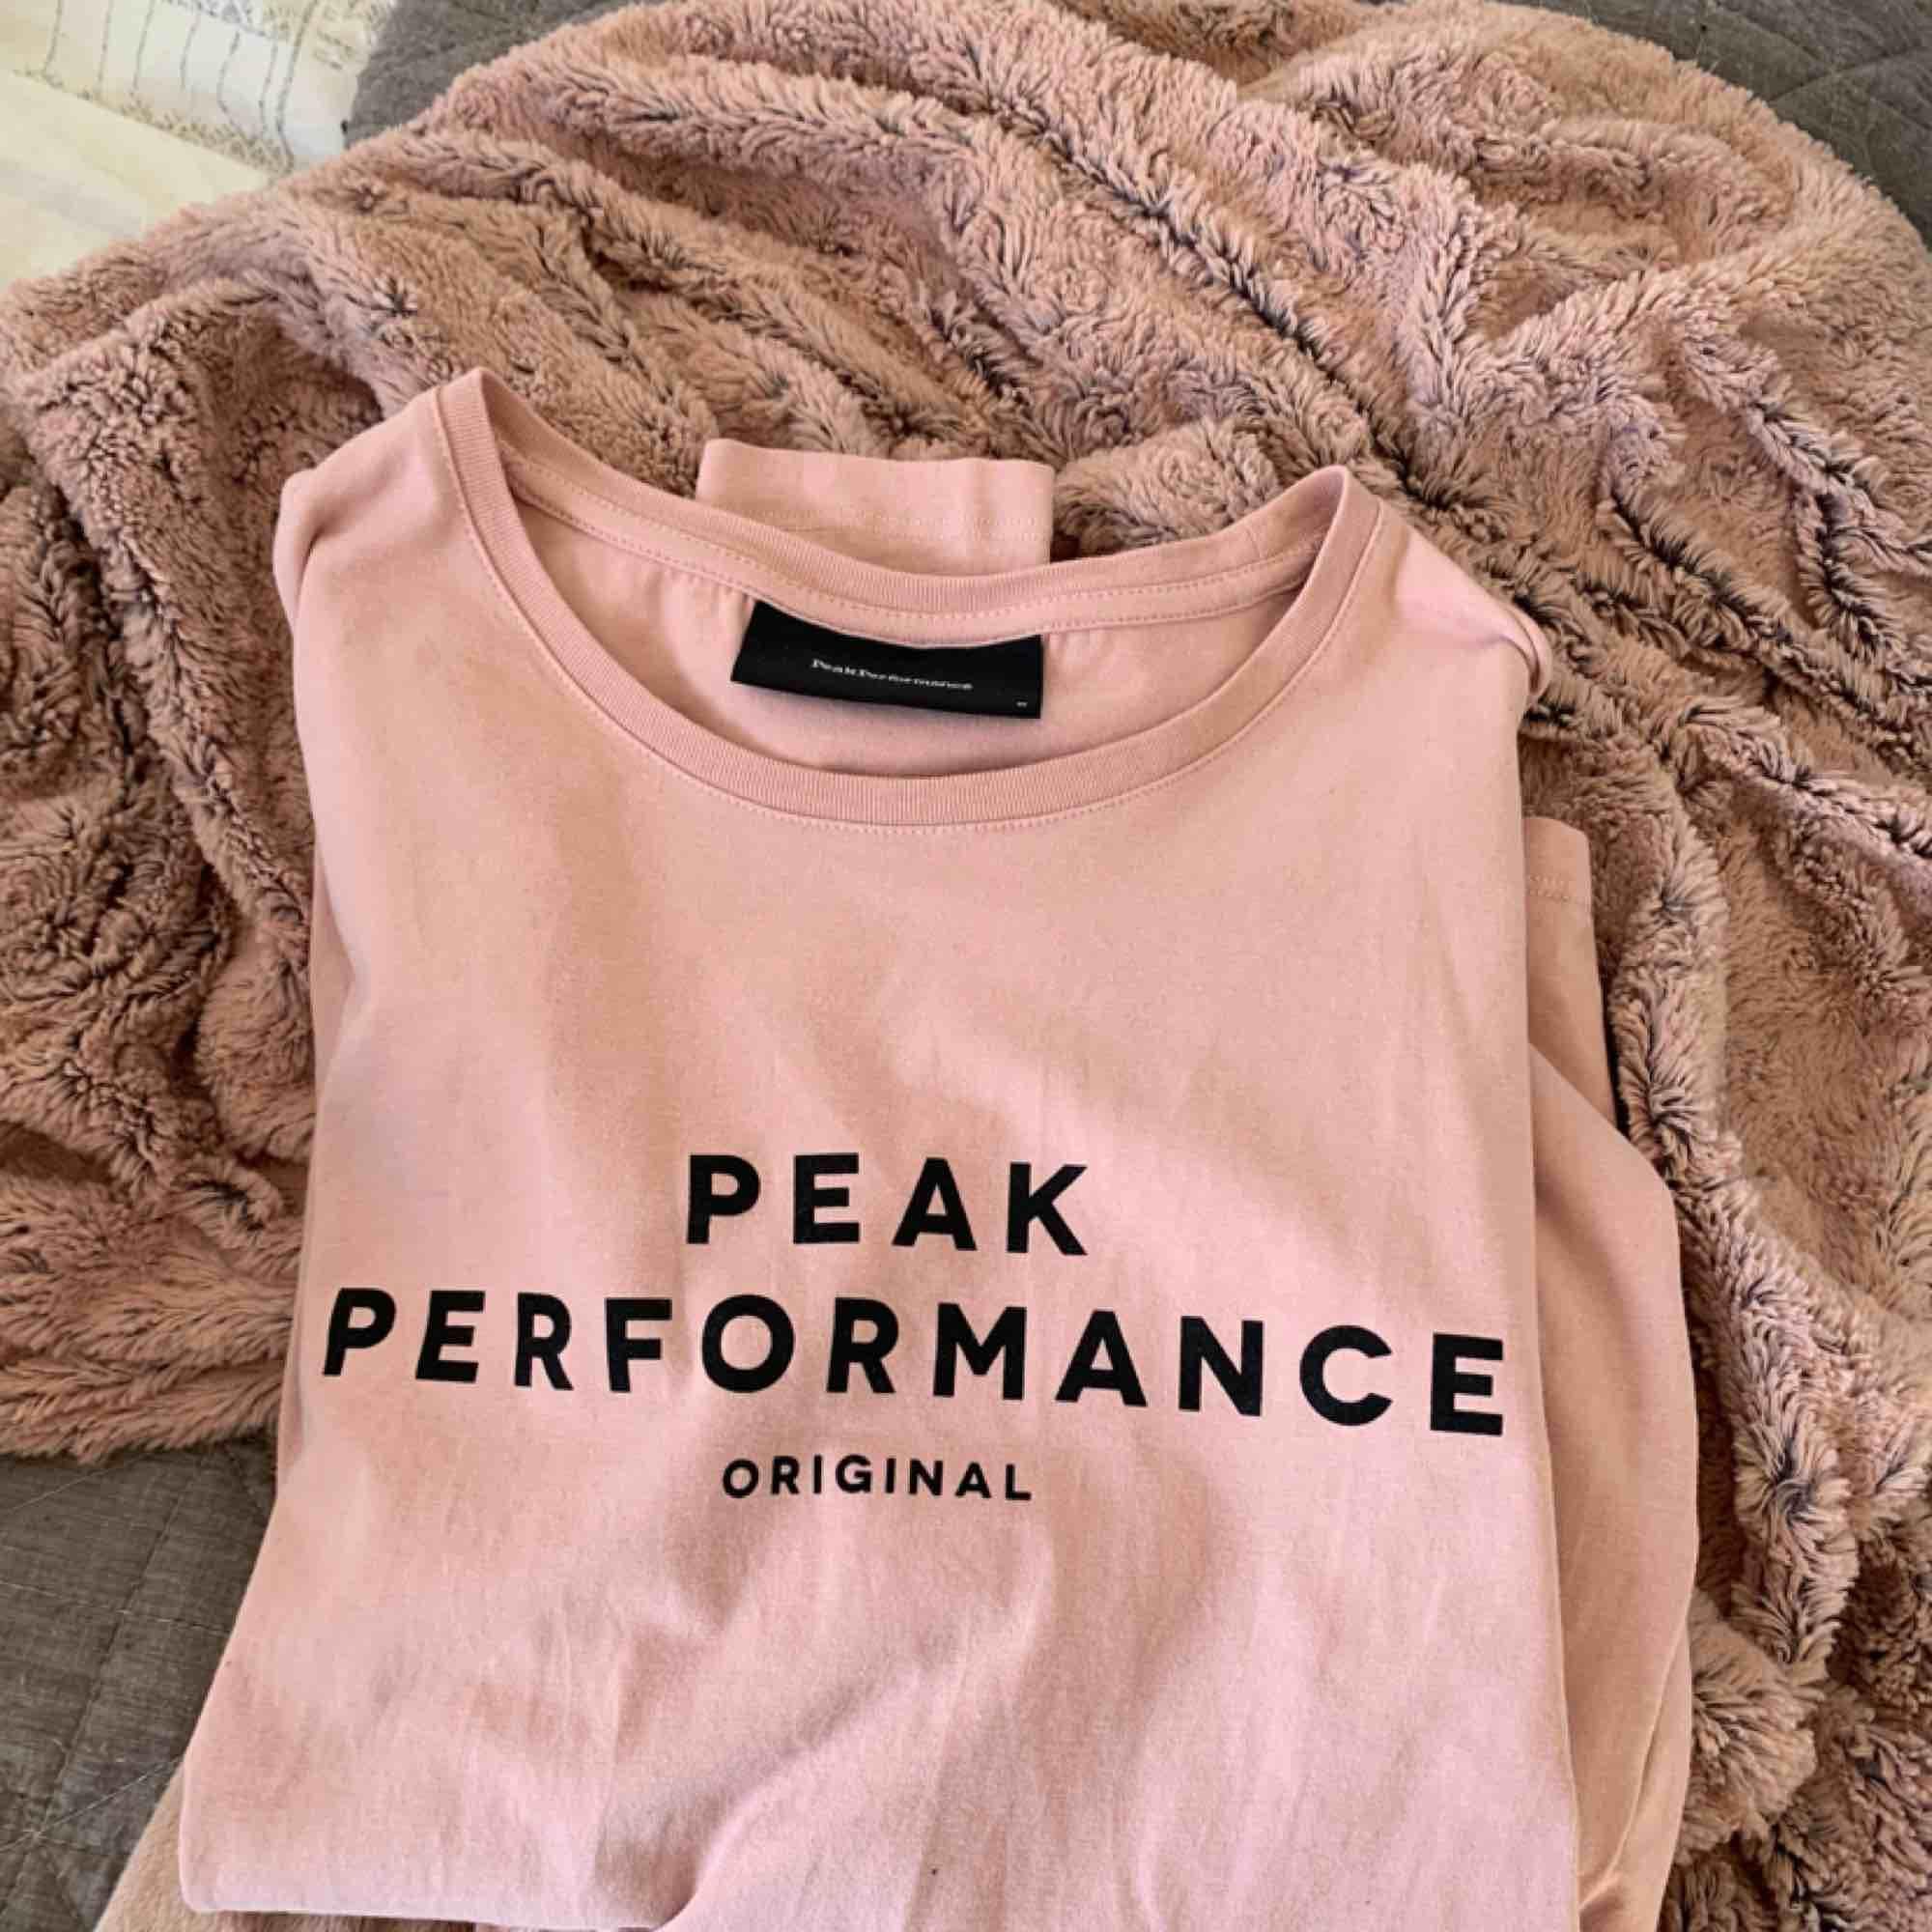 Supersnygg peakperformance tröja! Använd 2-4 gånger. Tar emot swish. T-shirts.